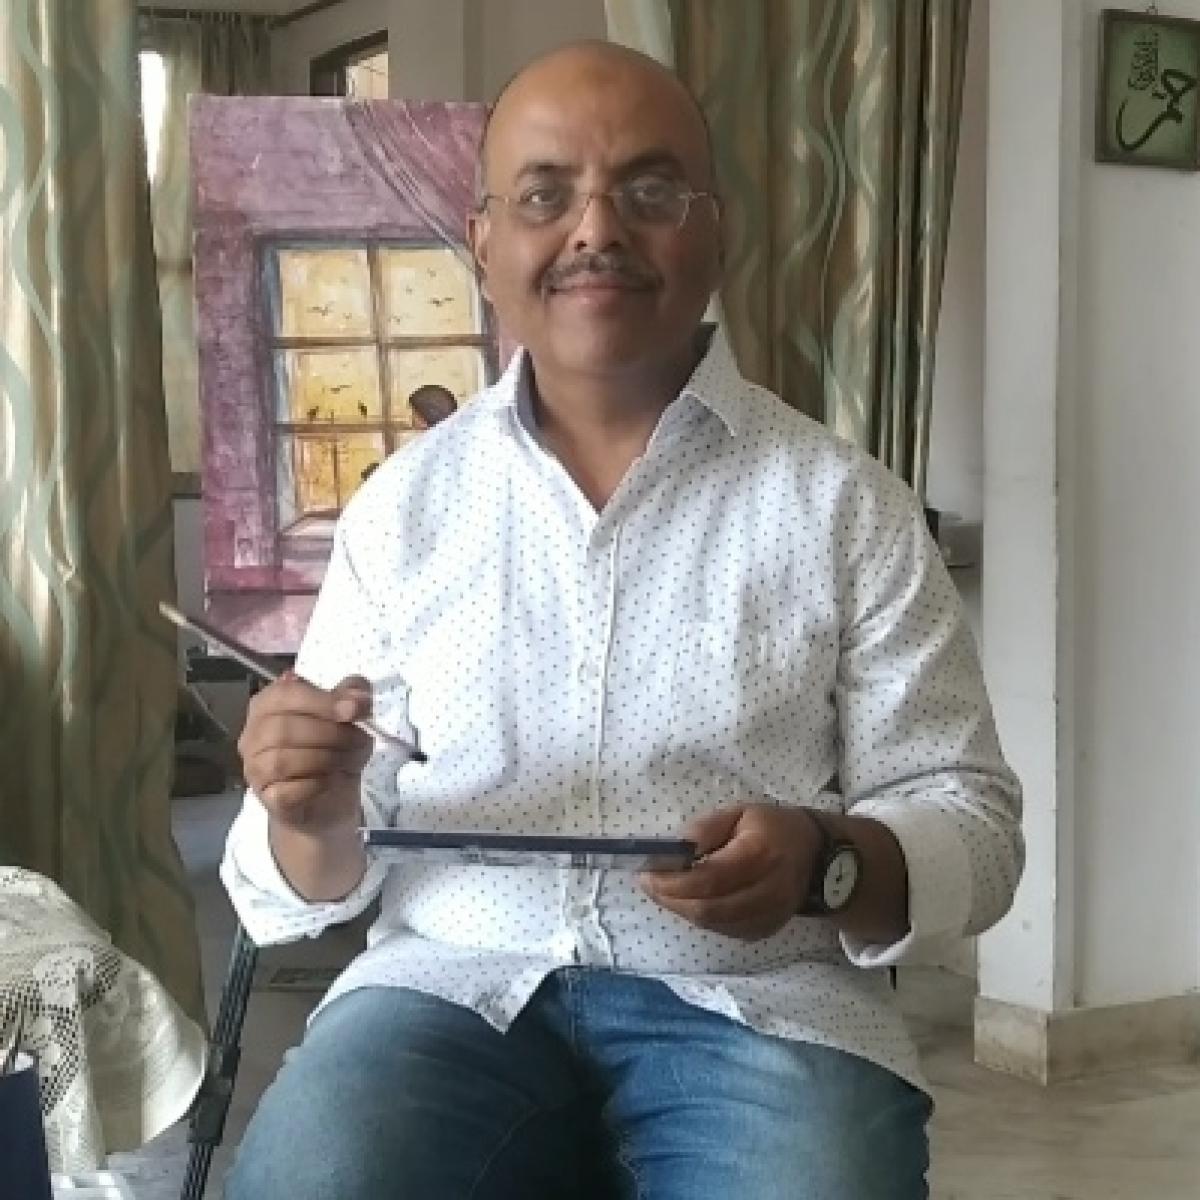 Bhopal: 'Gunah Passport Ka Tha' writer and artist Faisal Mateen auctions works to raise funds for corona